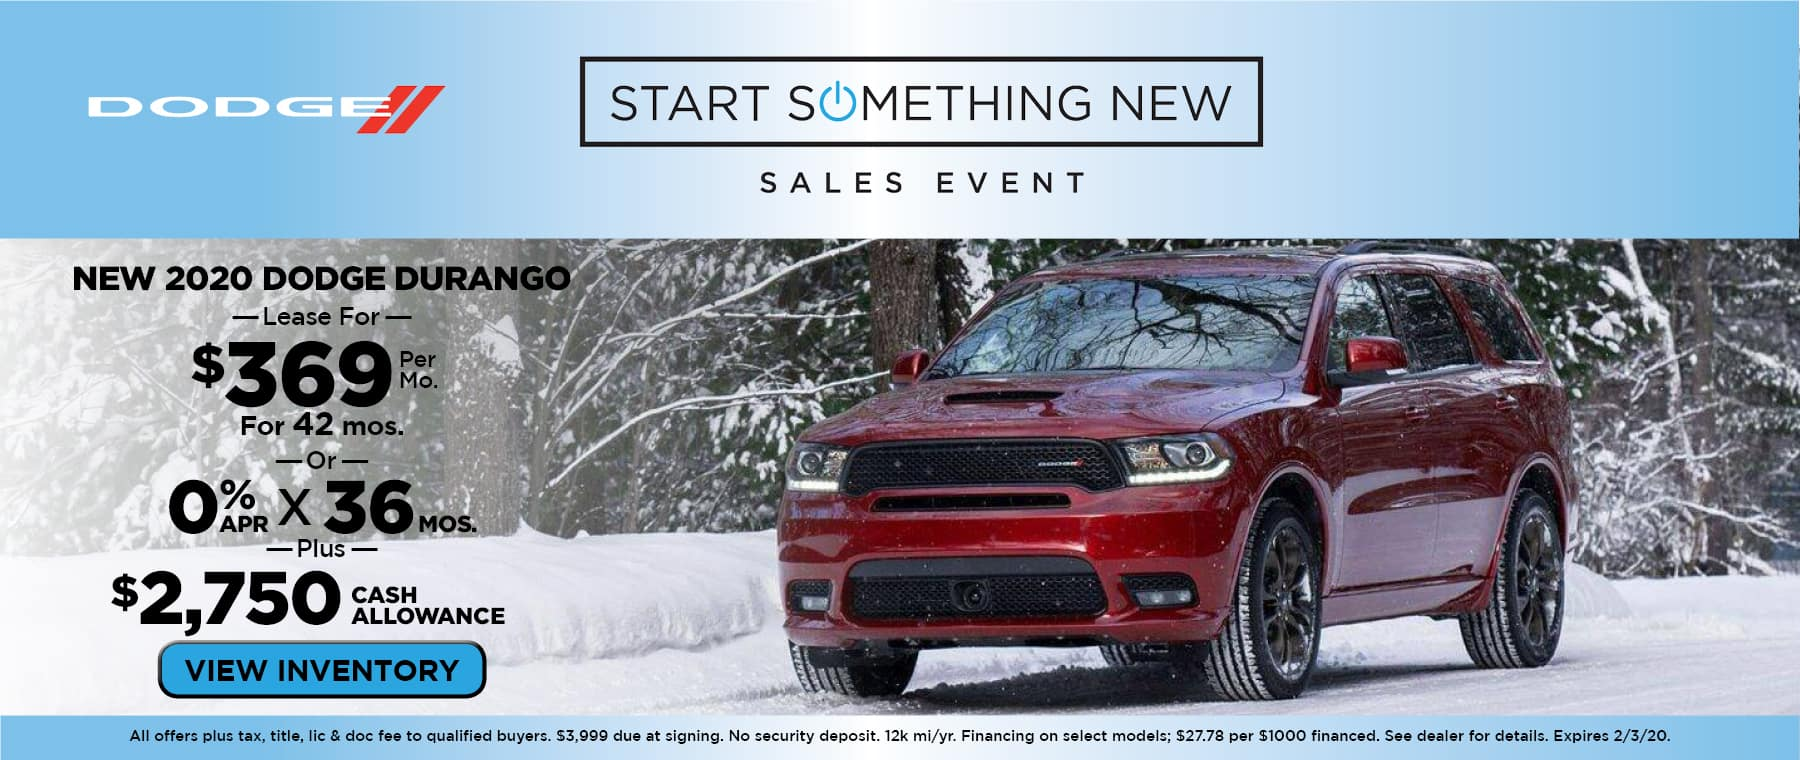 New 2020 Dodge Durango